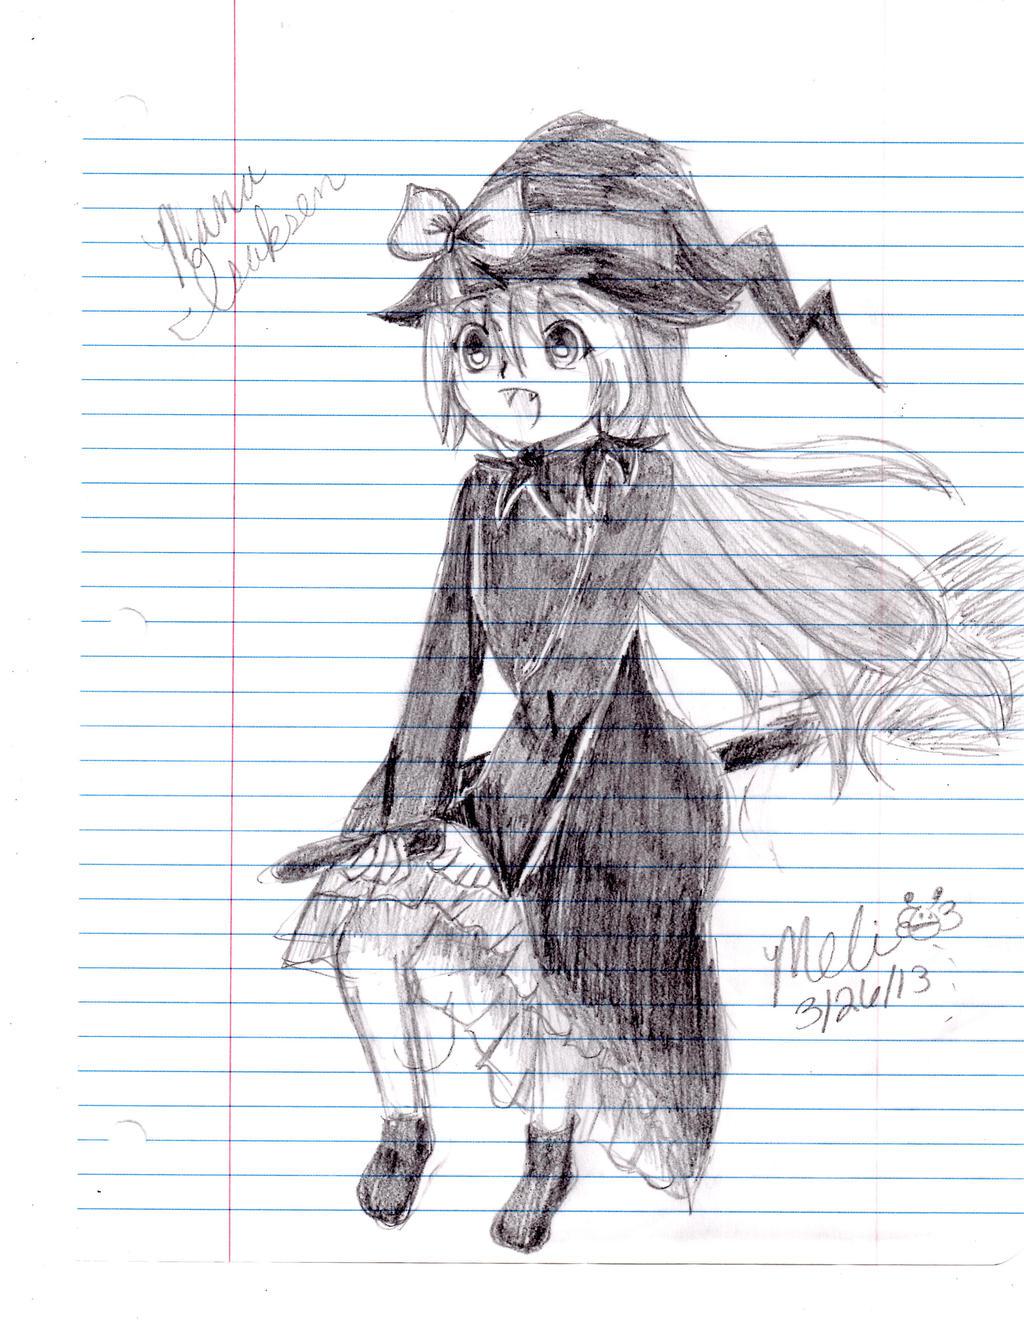 Nana the Little Witch by MitsukiChan313